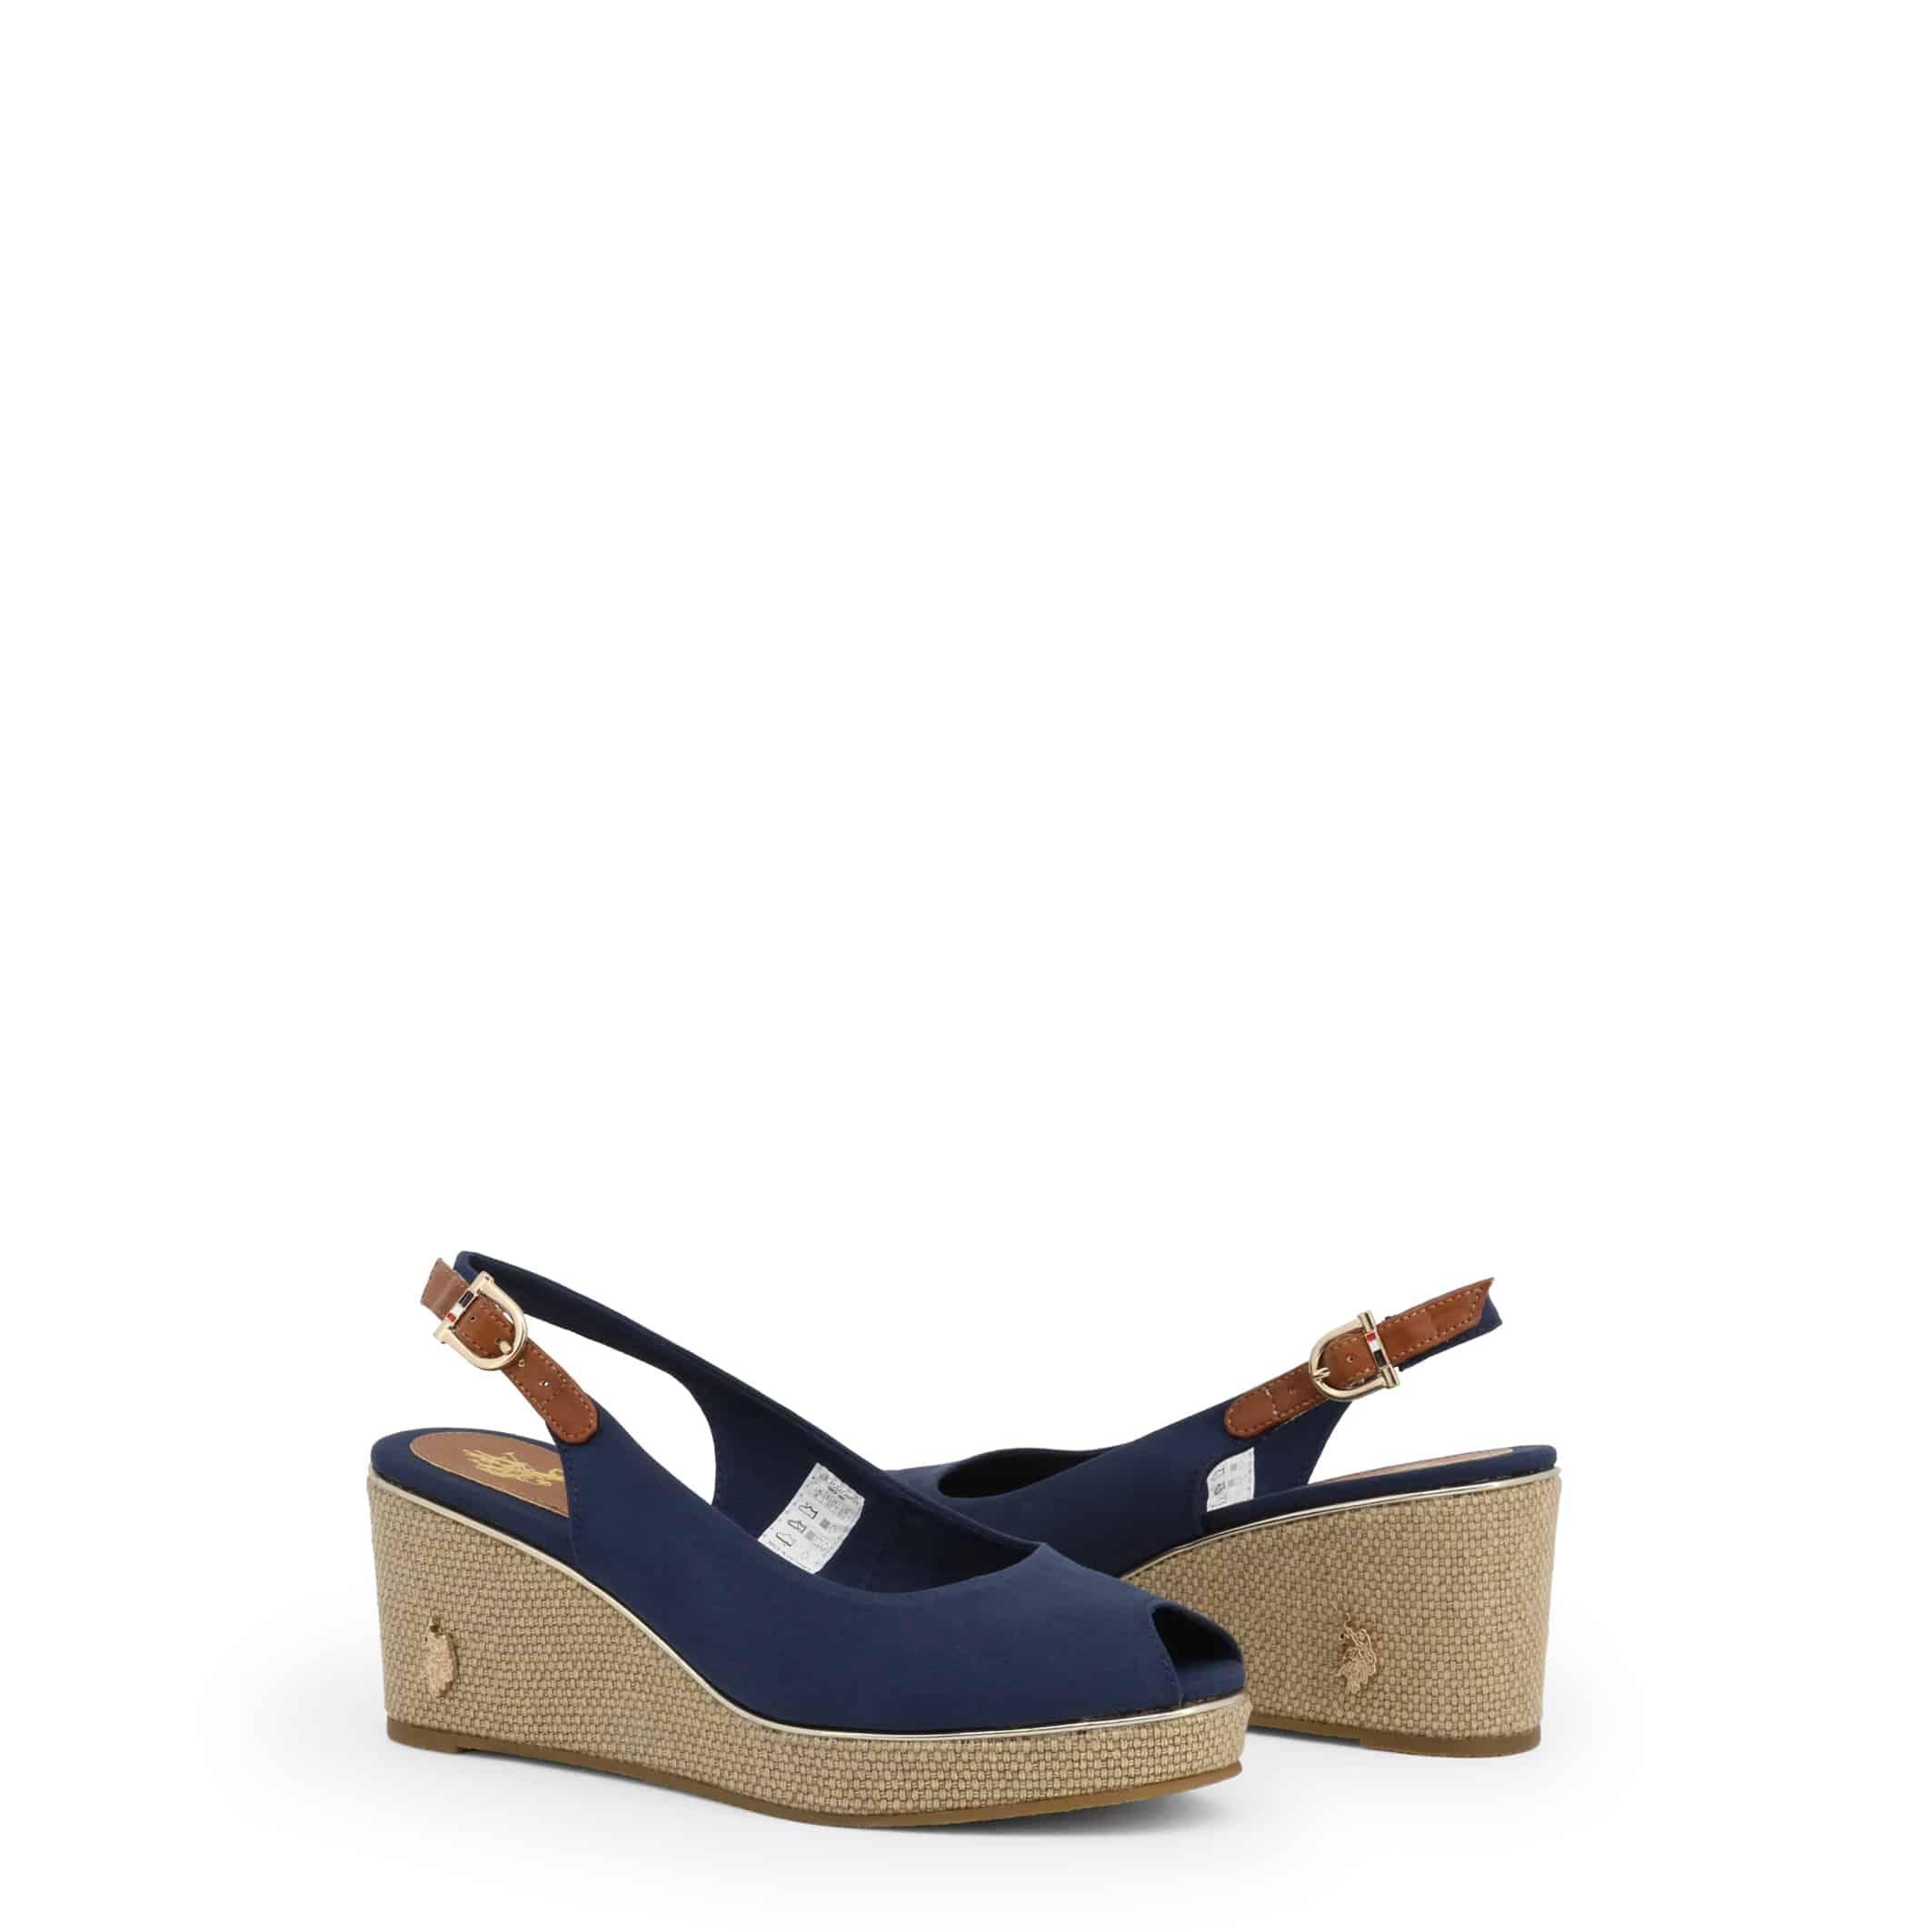 Sandales à plateforme U.S. Polo Assn. – AGATA4089S0_CY1